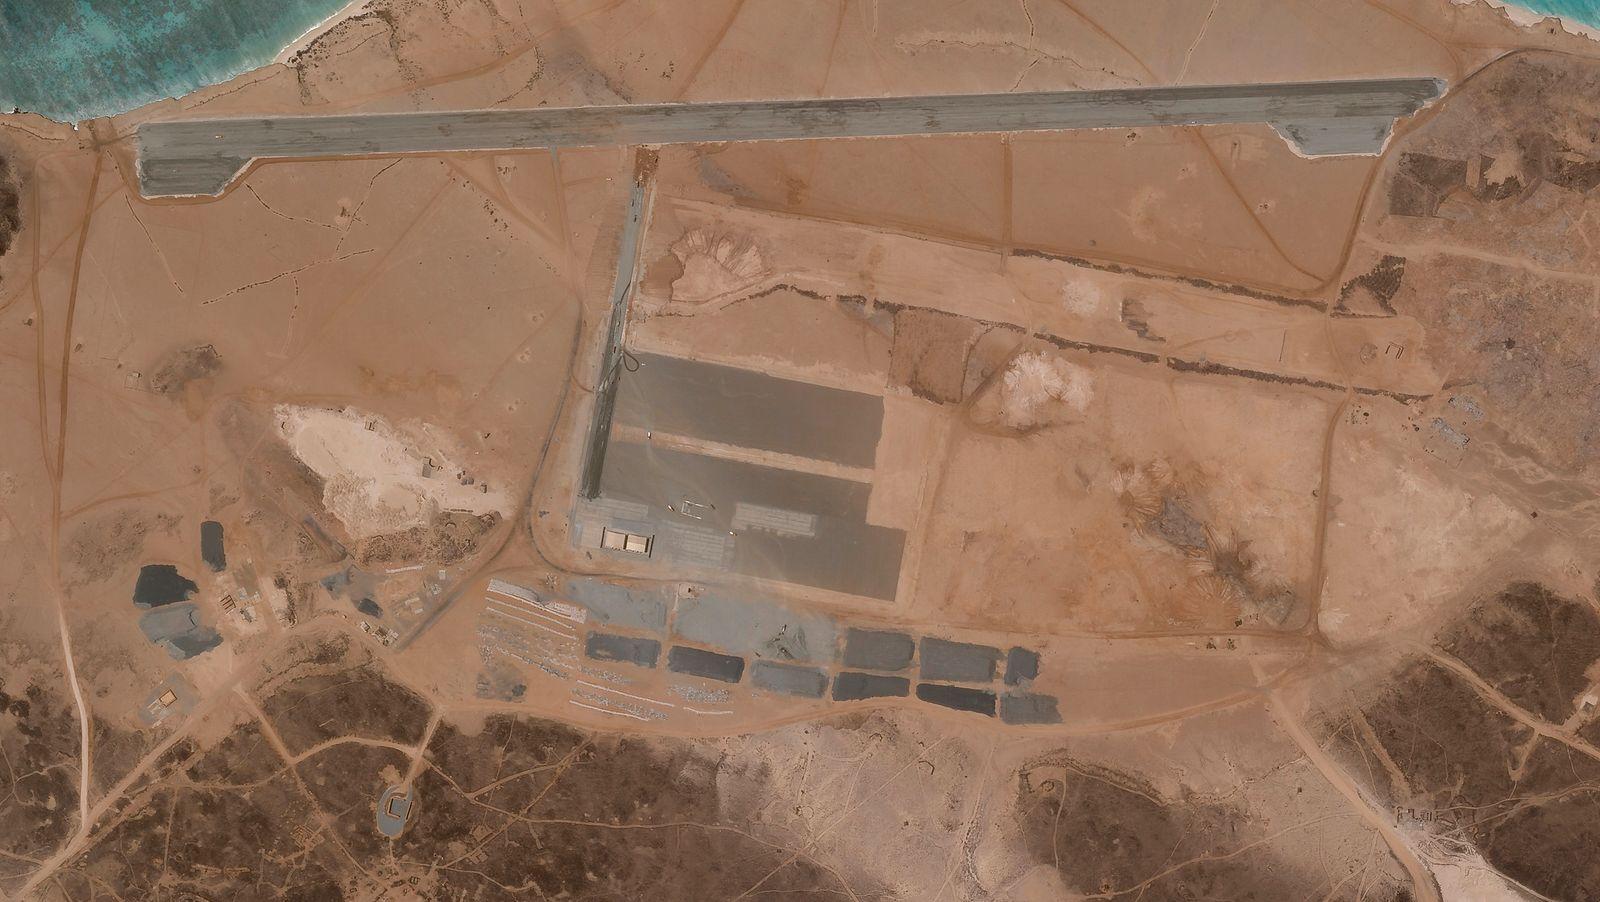 Yemen Mysterious Air Base